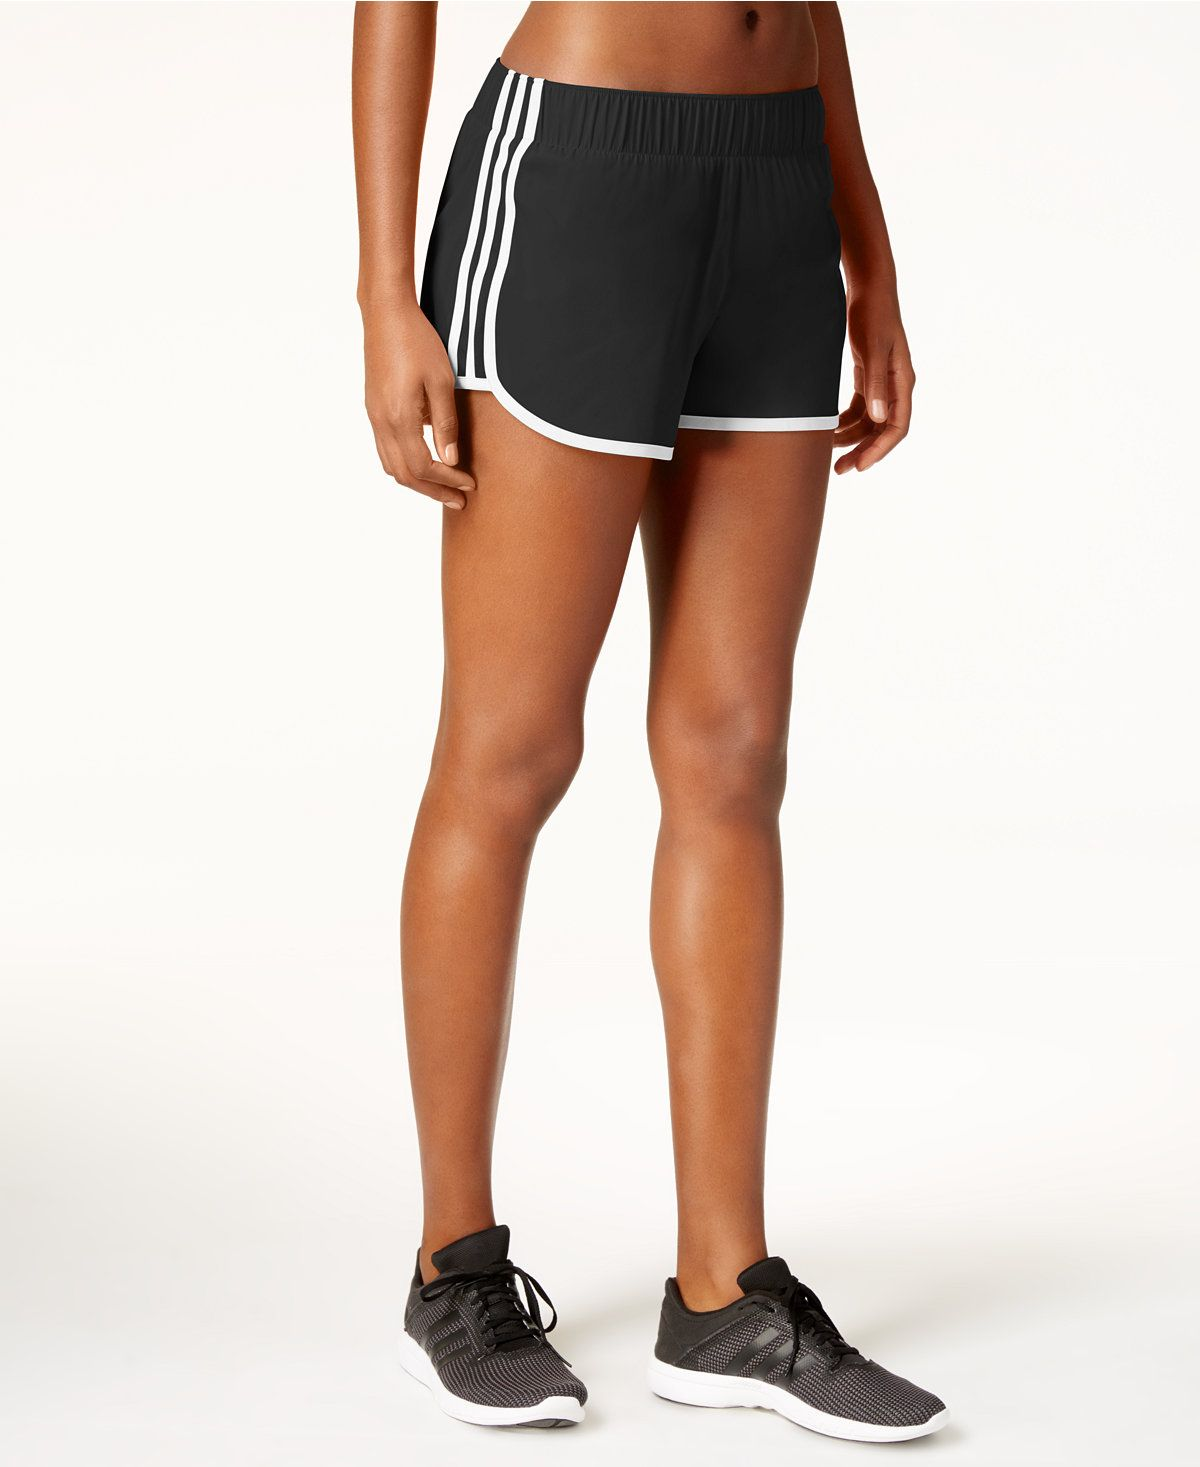 Adidas Climalite Junior Girls Shorts Bottoms Training Running Summer Colorful